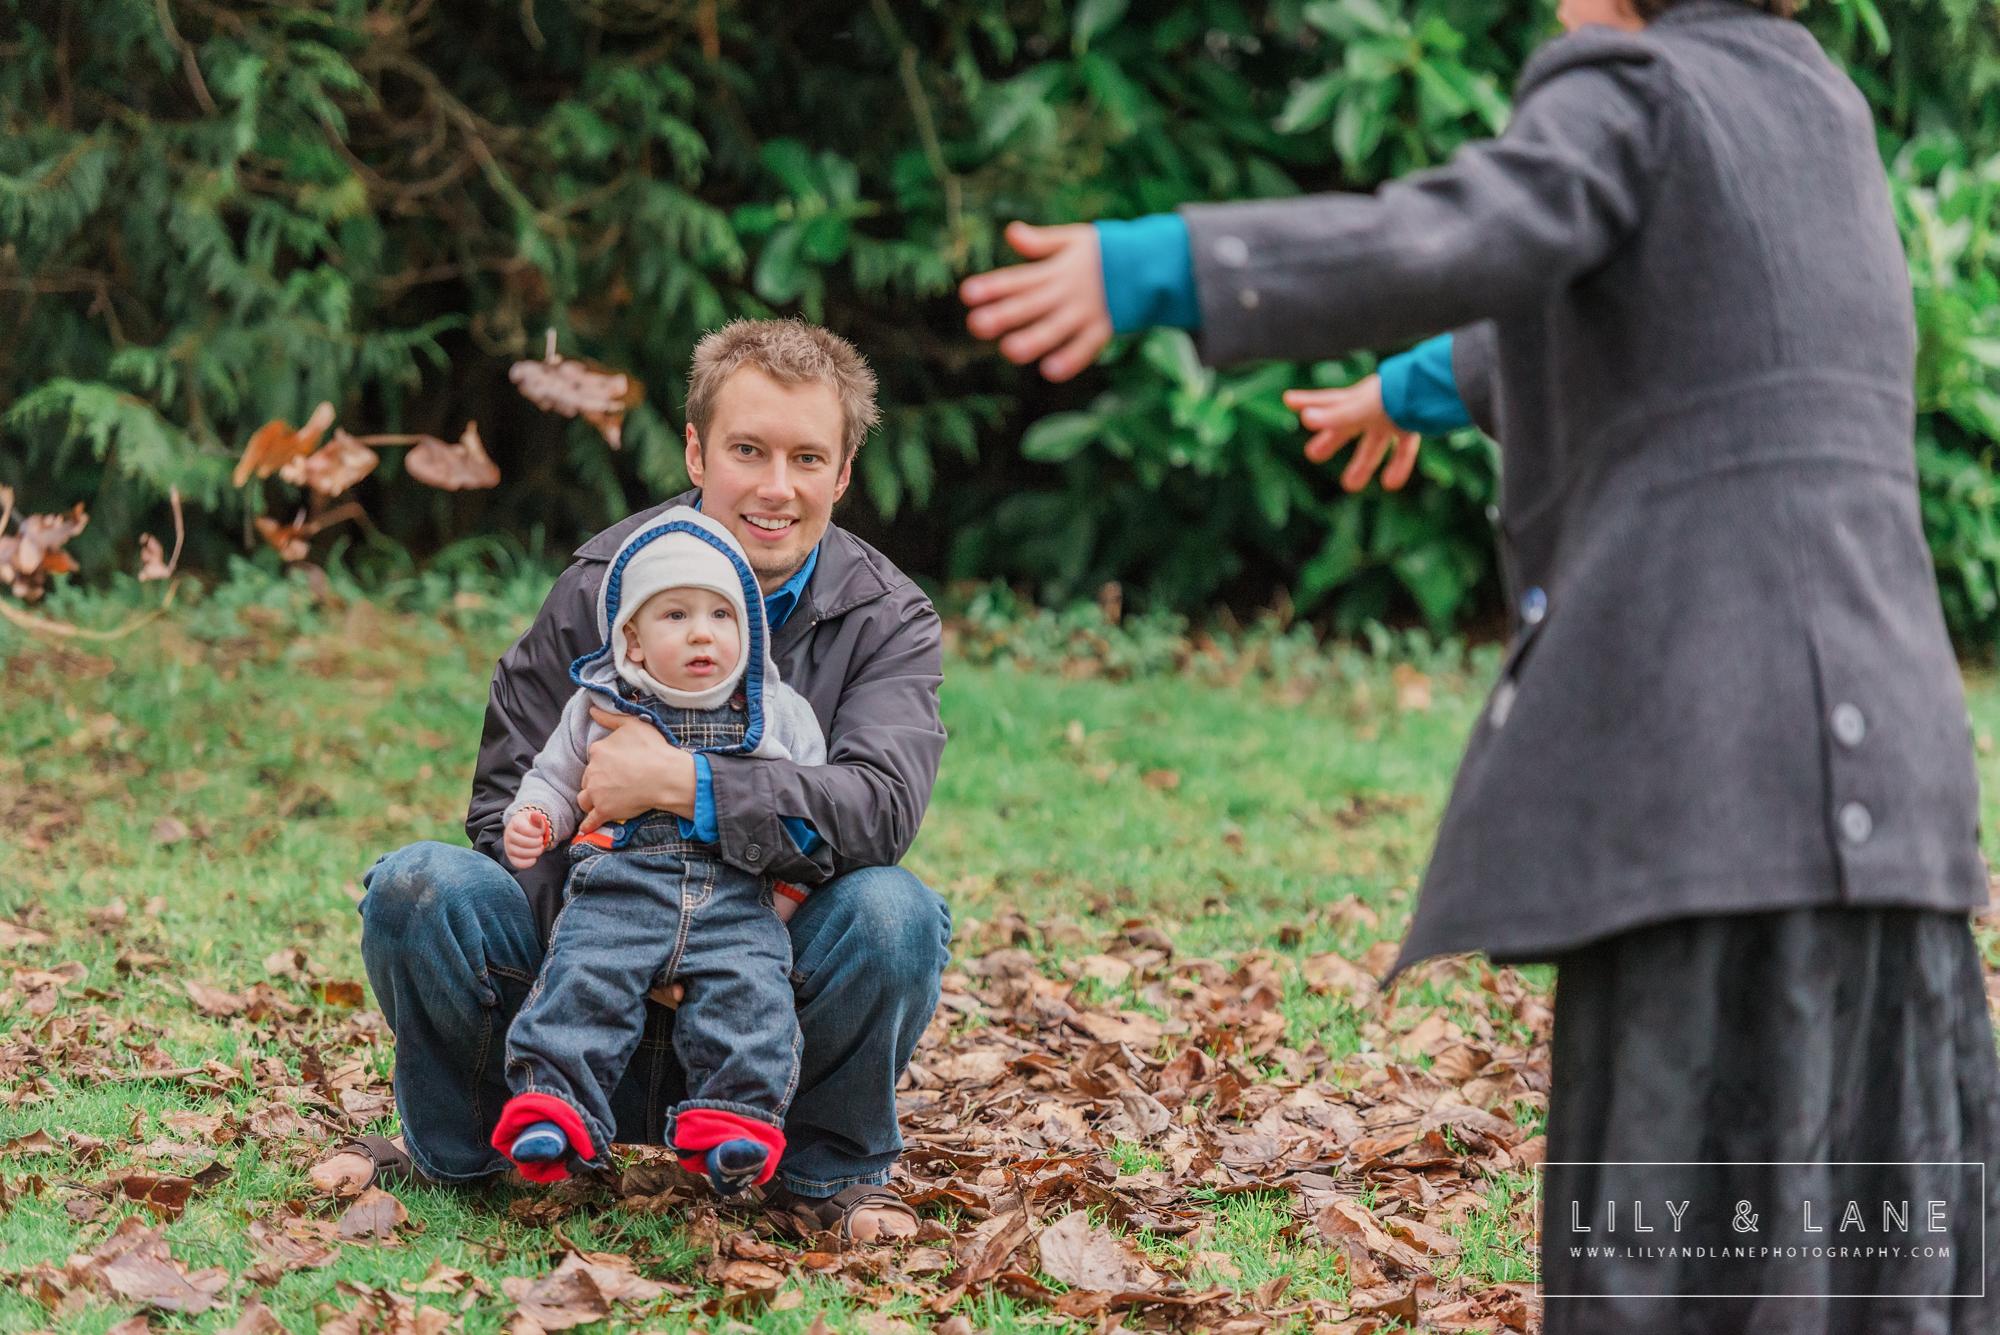 LilyandLane_VictoriaBC_ChildrensPhotography (24).jpg